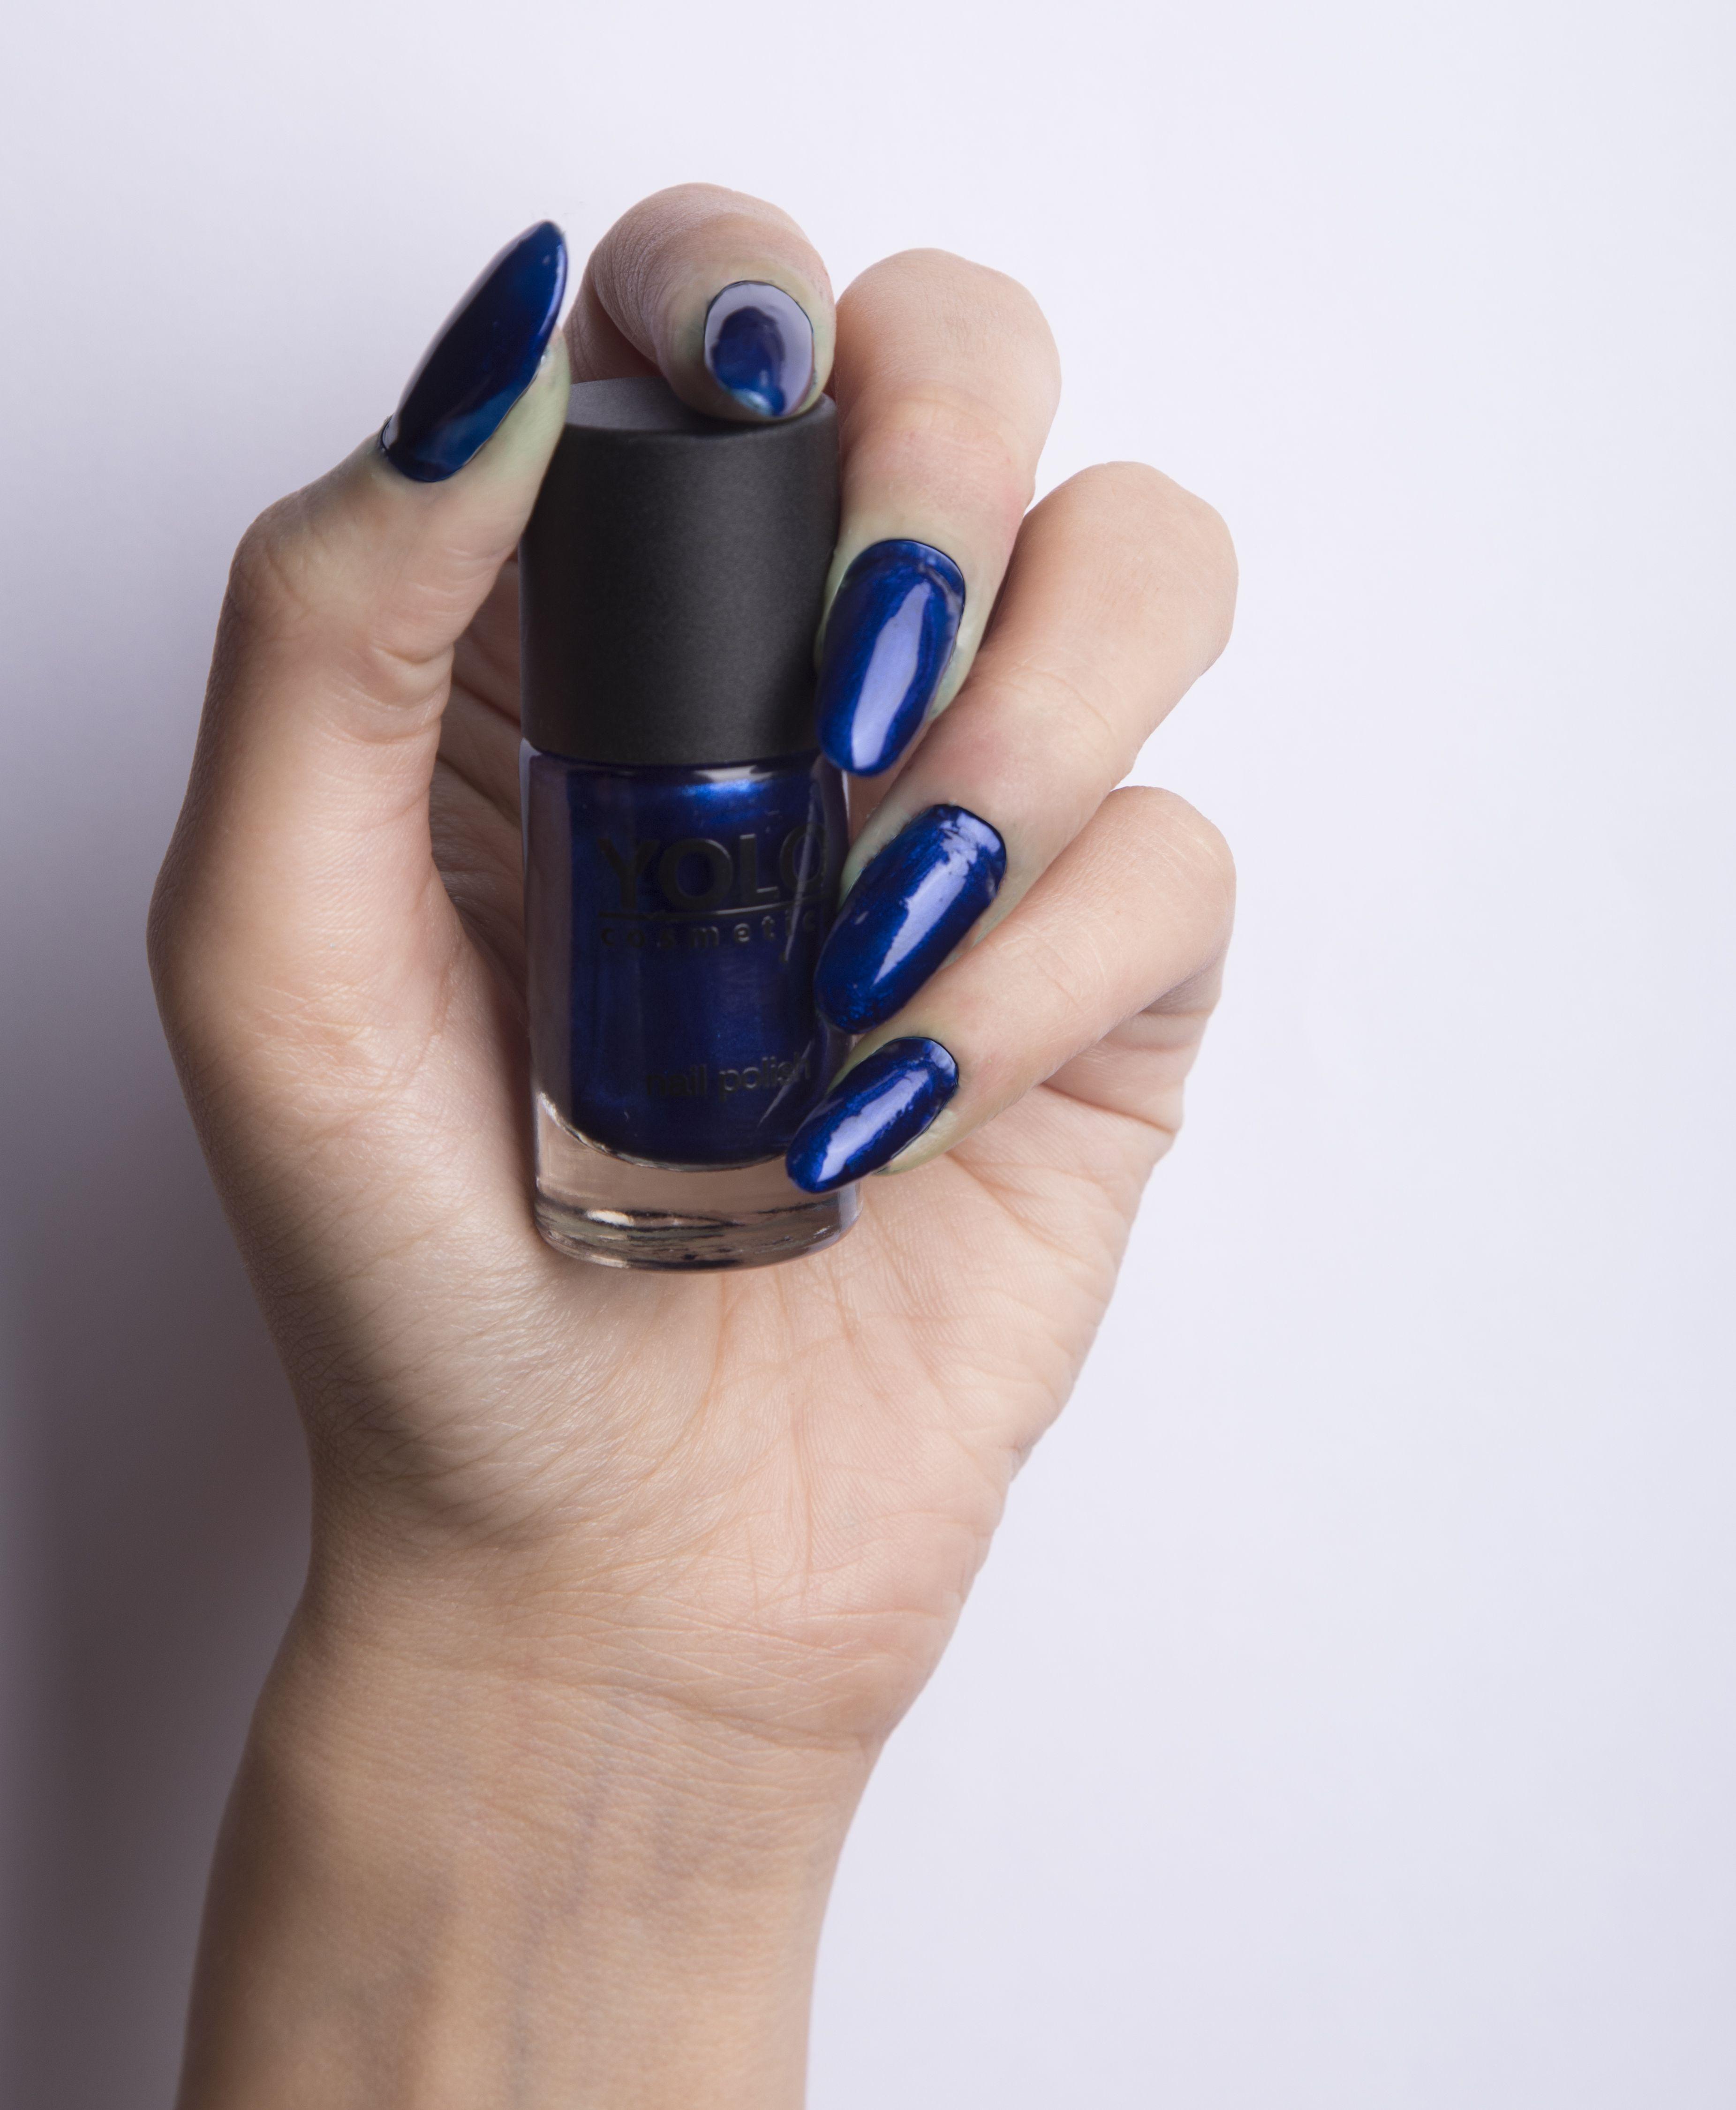 152 MIDNIGHT YOLO nails summer photo galaxy colors